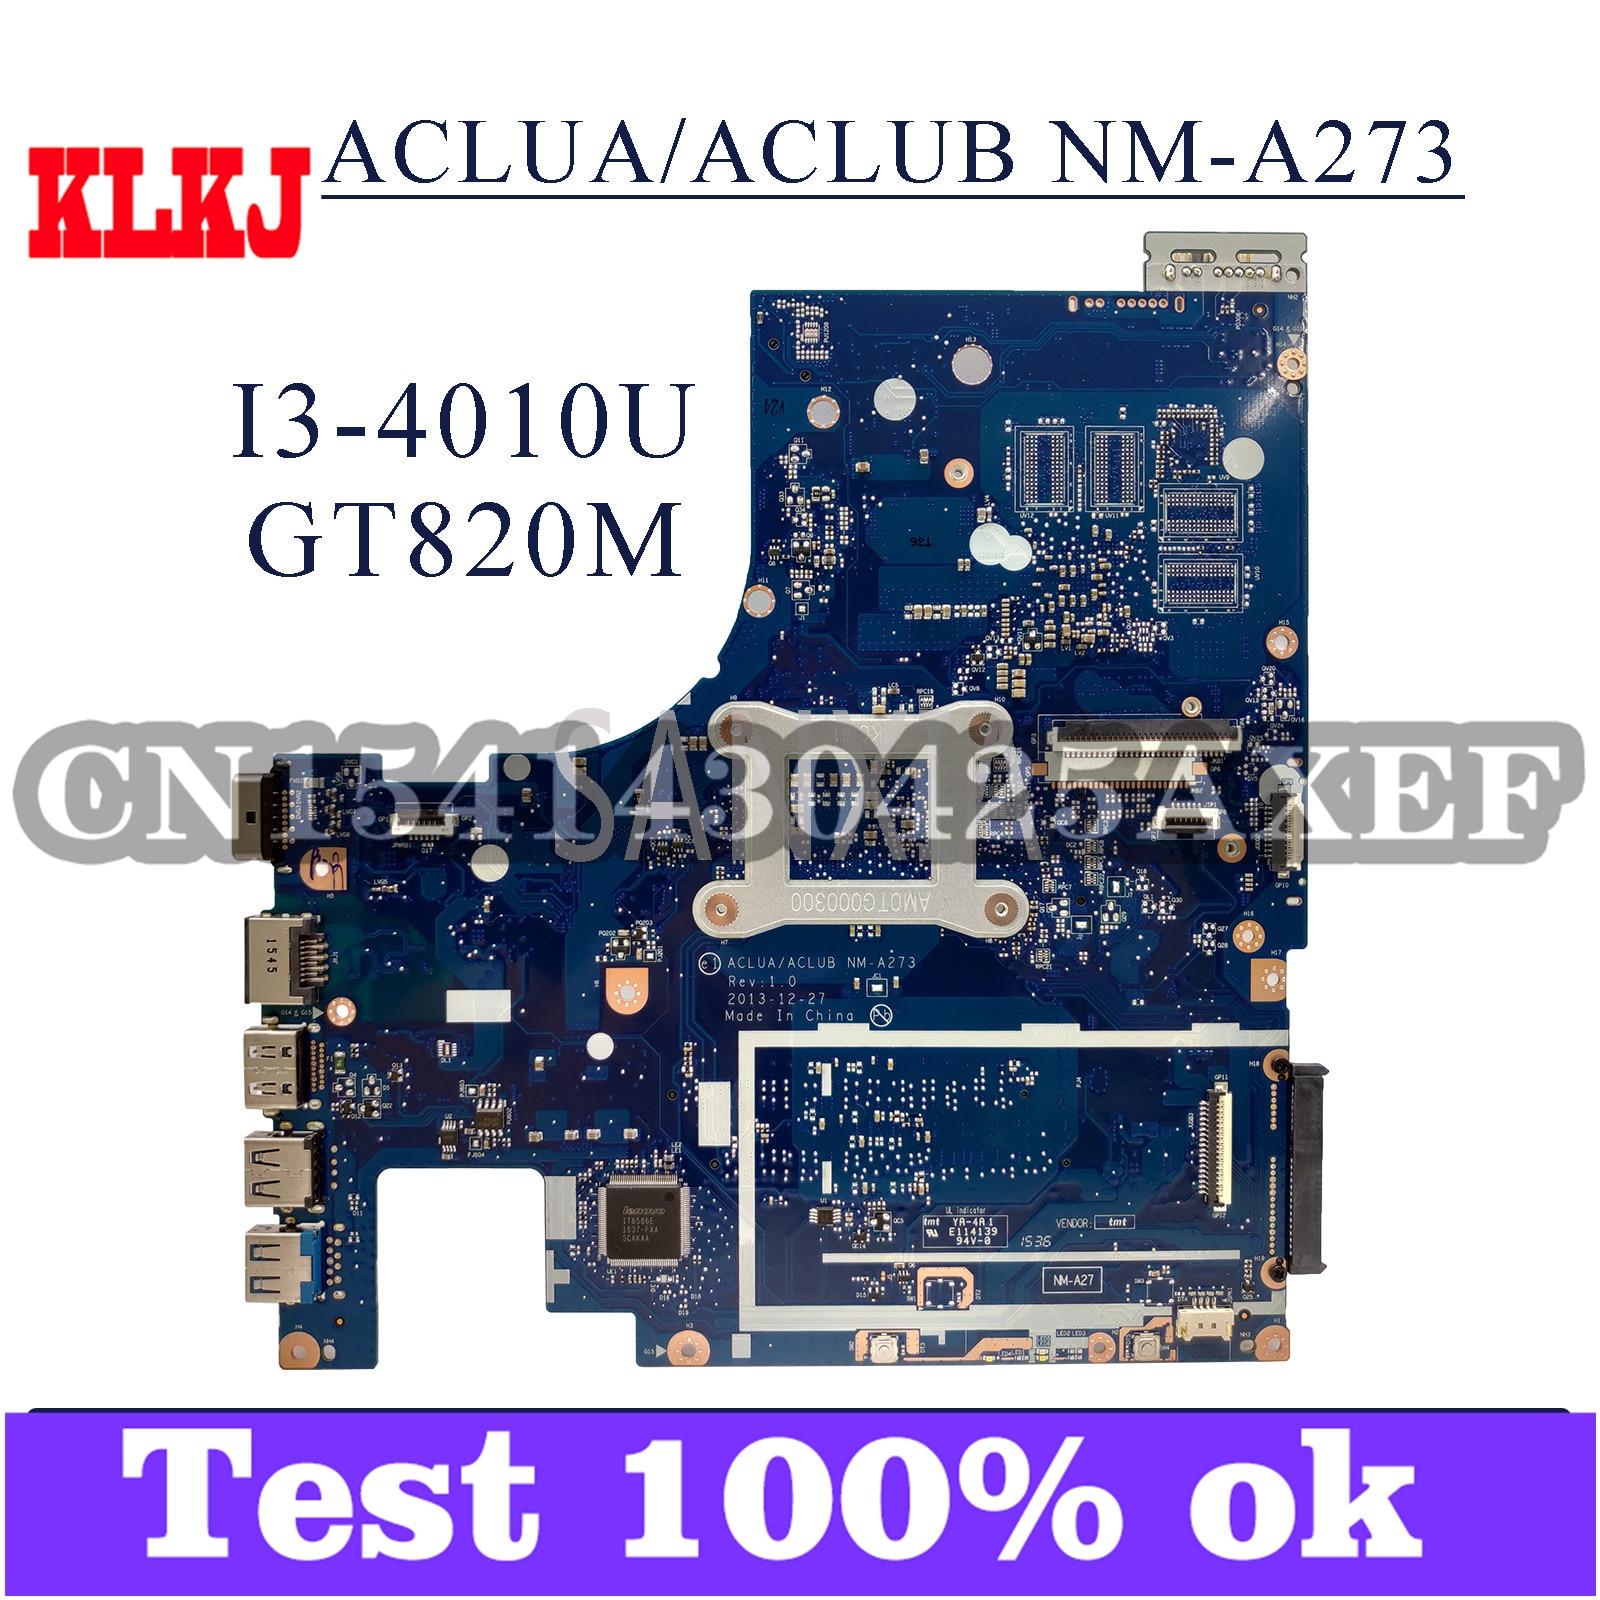 KLKJ NM-A273 اللوحة المحمول لينوفو G50-70M Z50-70 اللوحة الأصلية I3-4010U GT820M